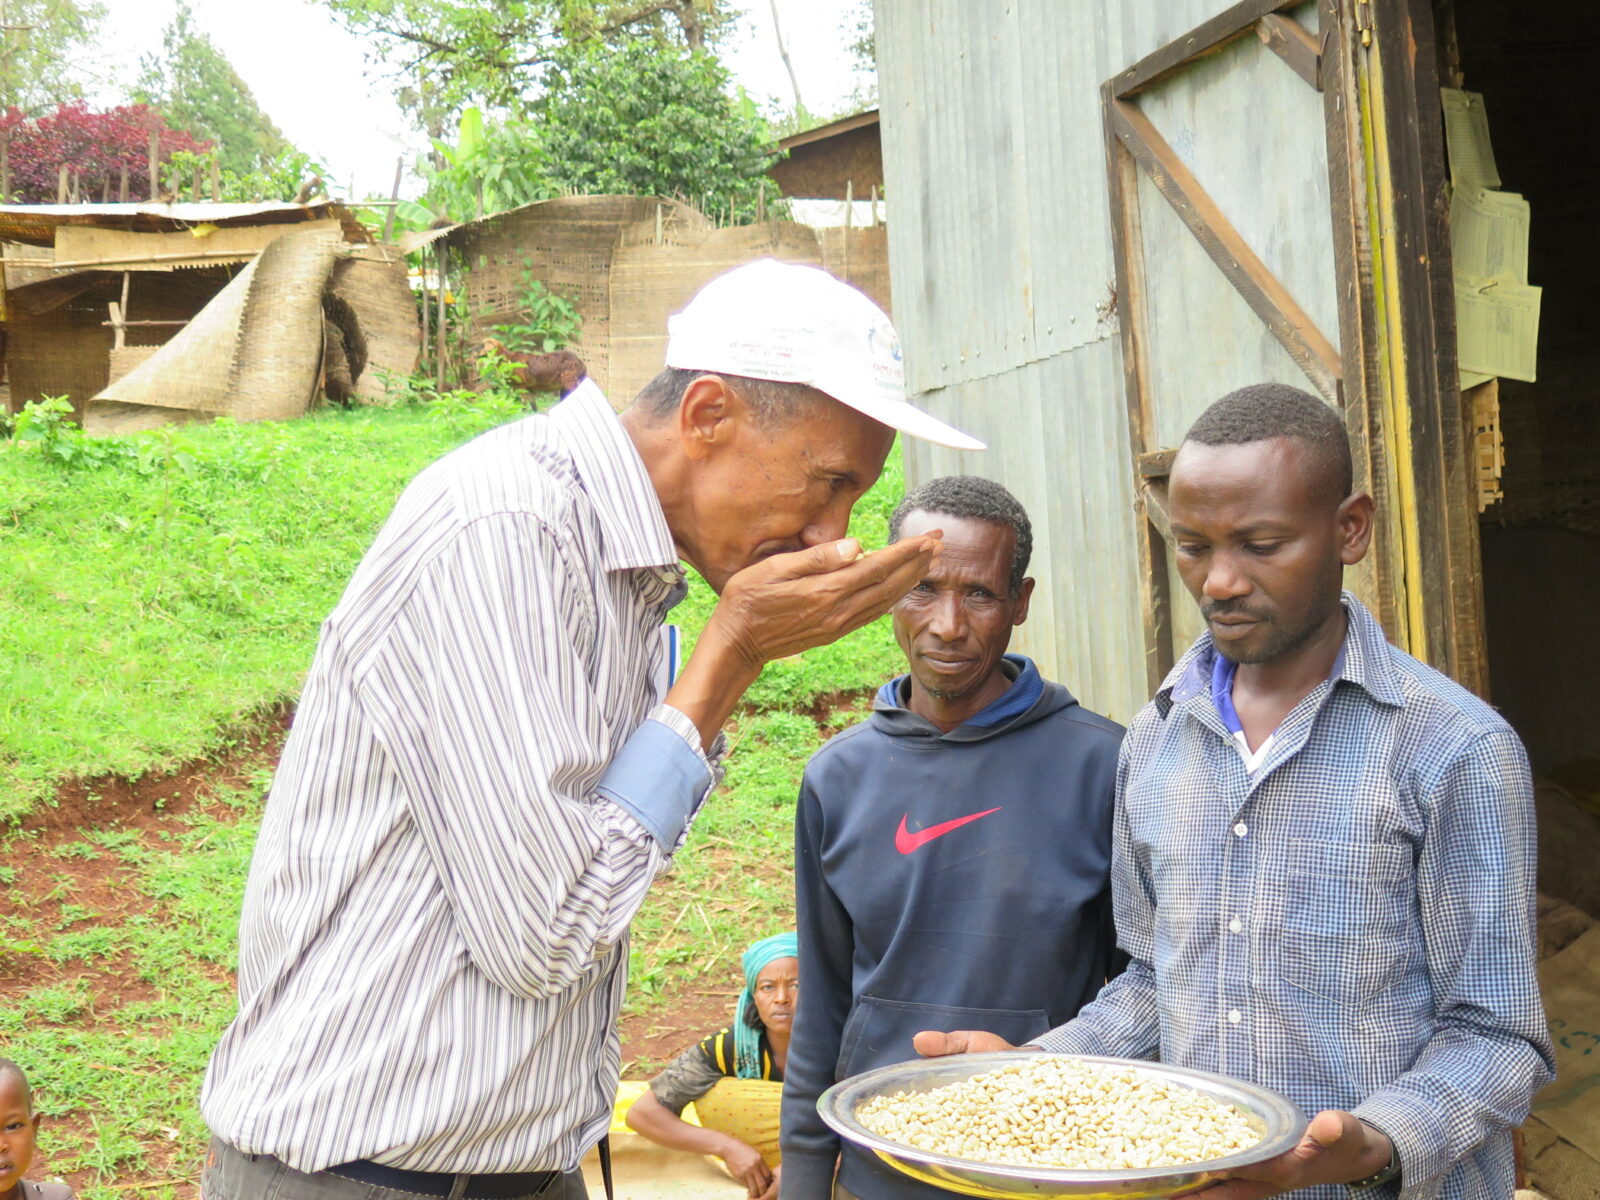 Oromia, Etiopien, kaffe, ISD, 2015, skuggkaffe, kaffe, ekologiskt, odling, Kaffeodling, kvalitetskontroll